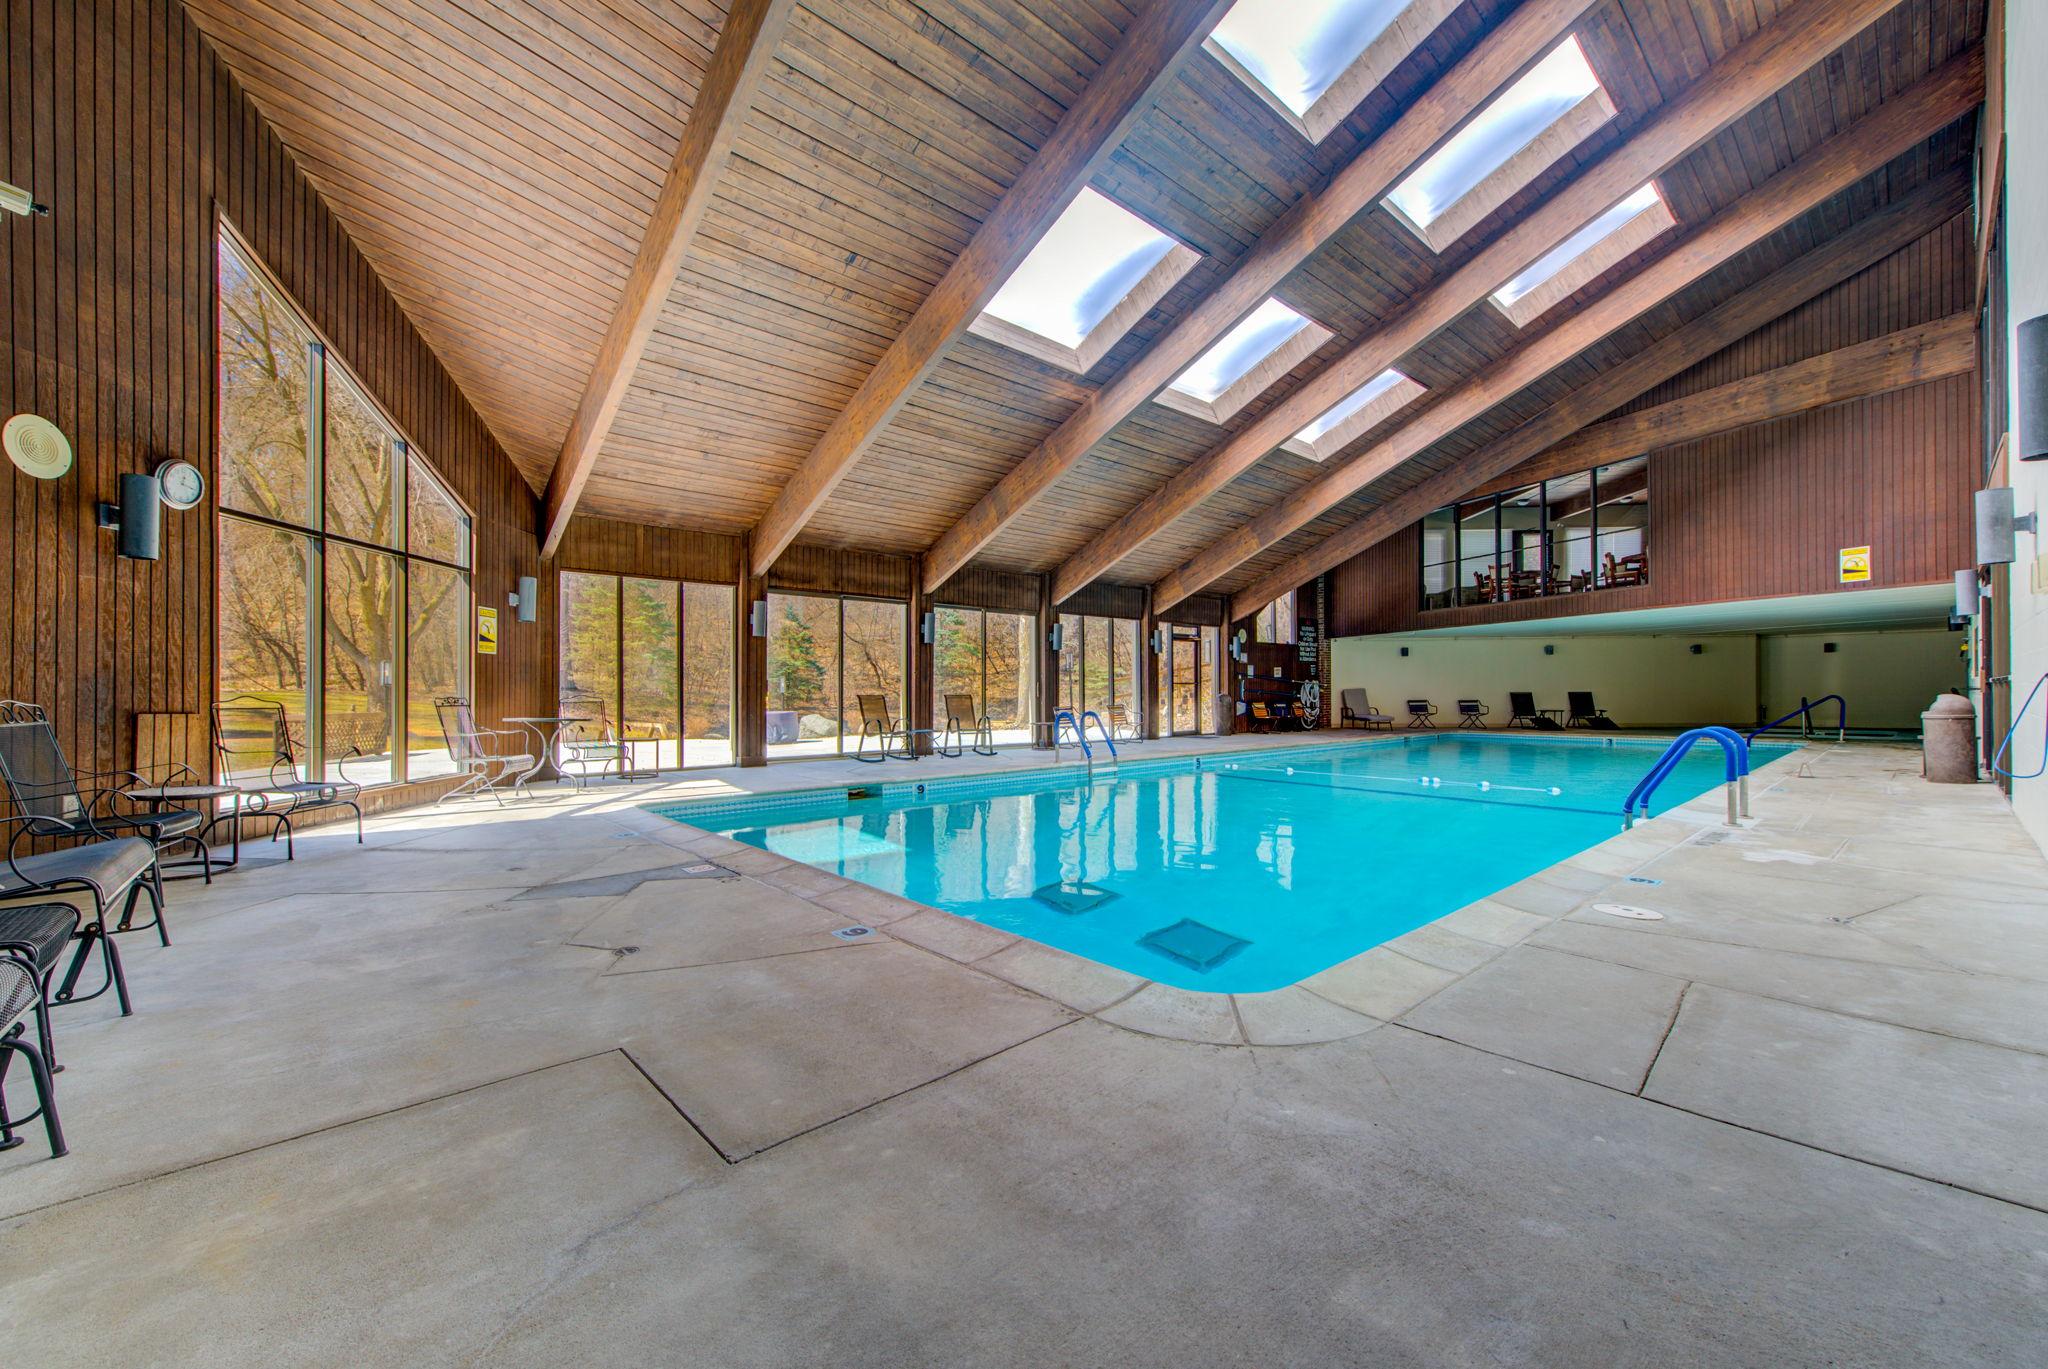 Building - Pool